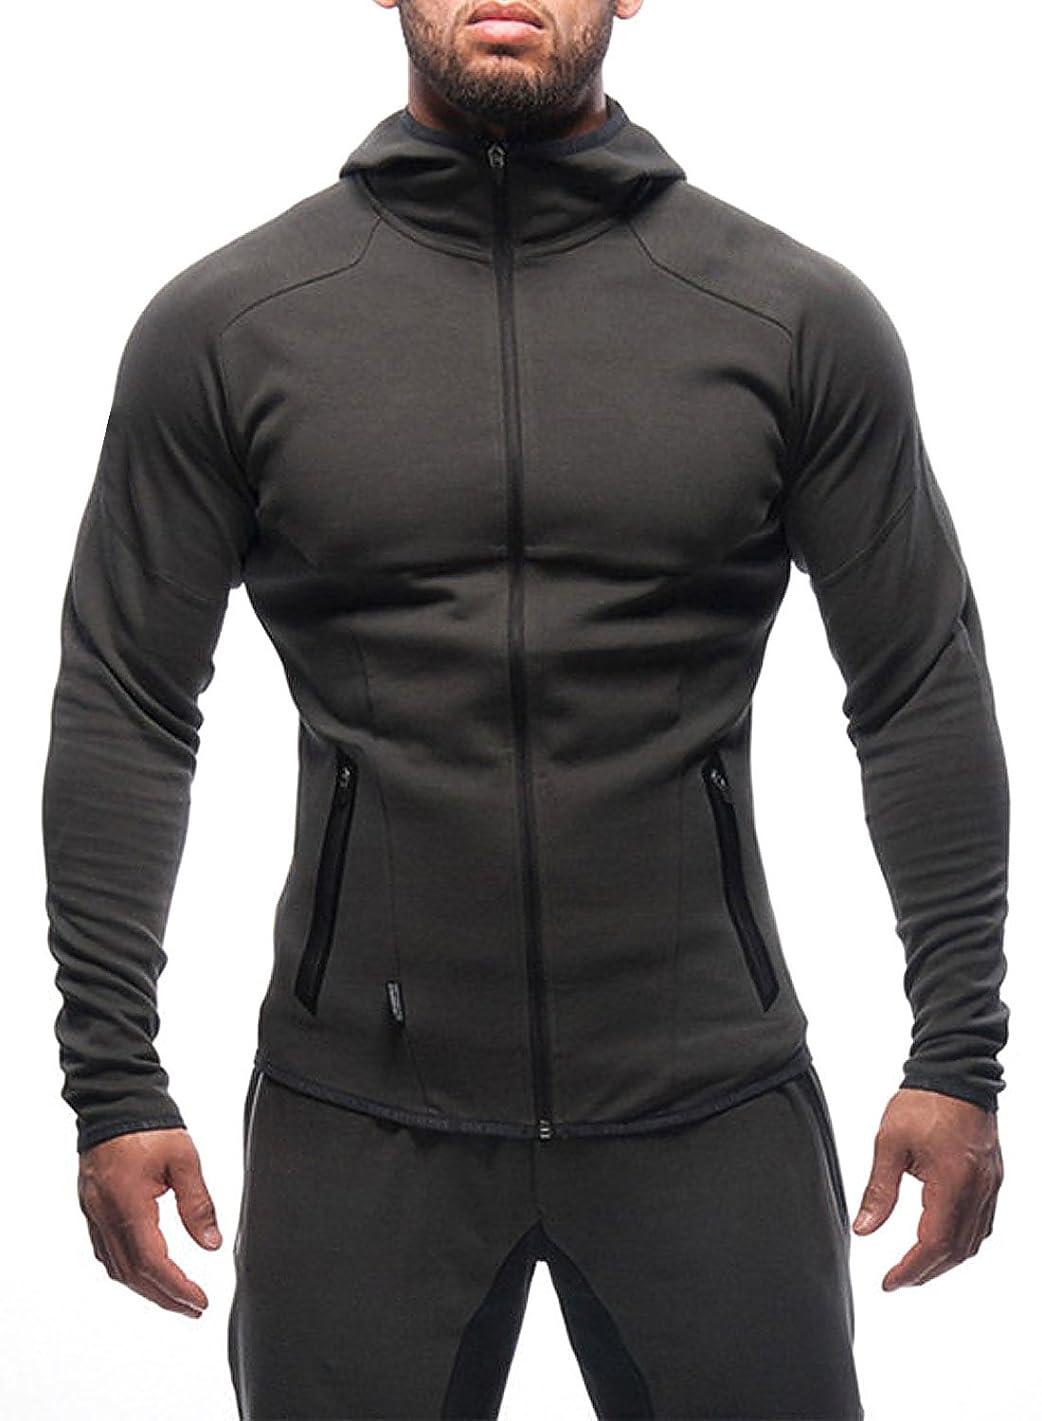 Ouber Running Yoga Slim UV Protect Sweatshirts with Two Side Pocket Jacket Coat